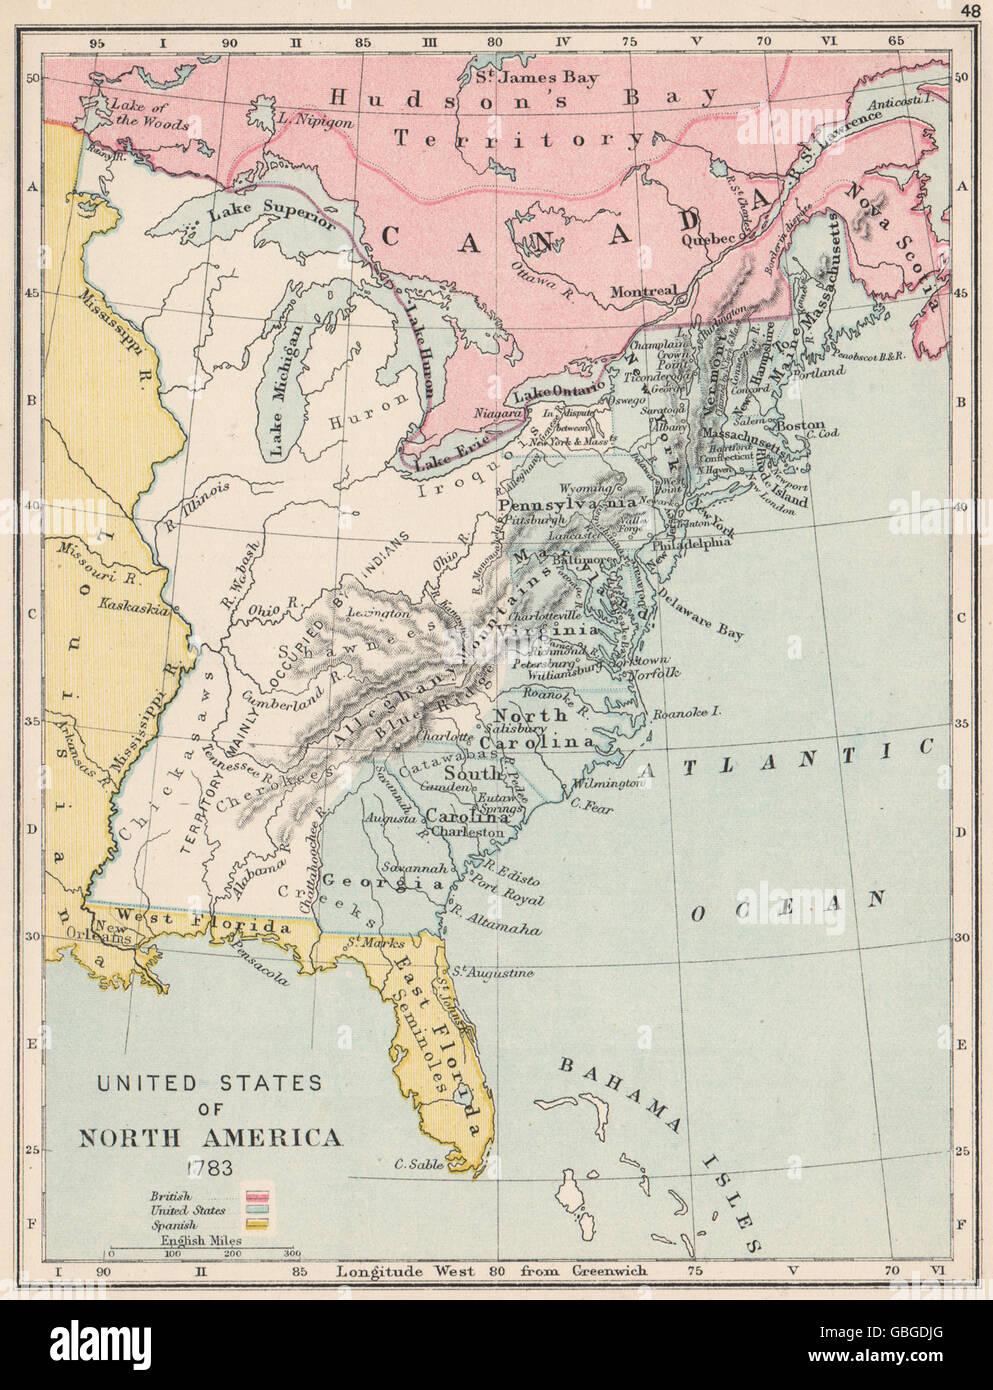 USA IN North America Spanish Florida Louisiana - North louisiana map